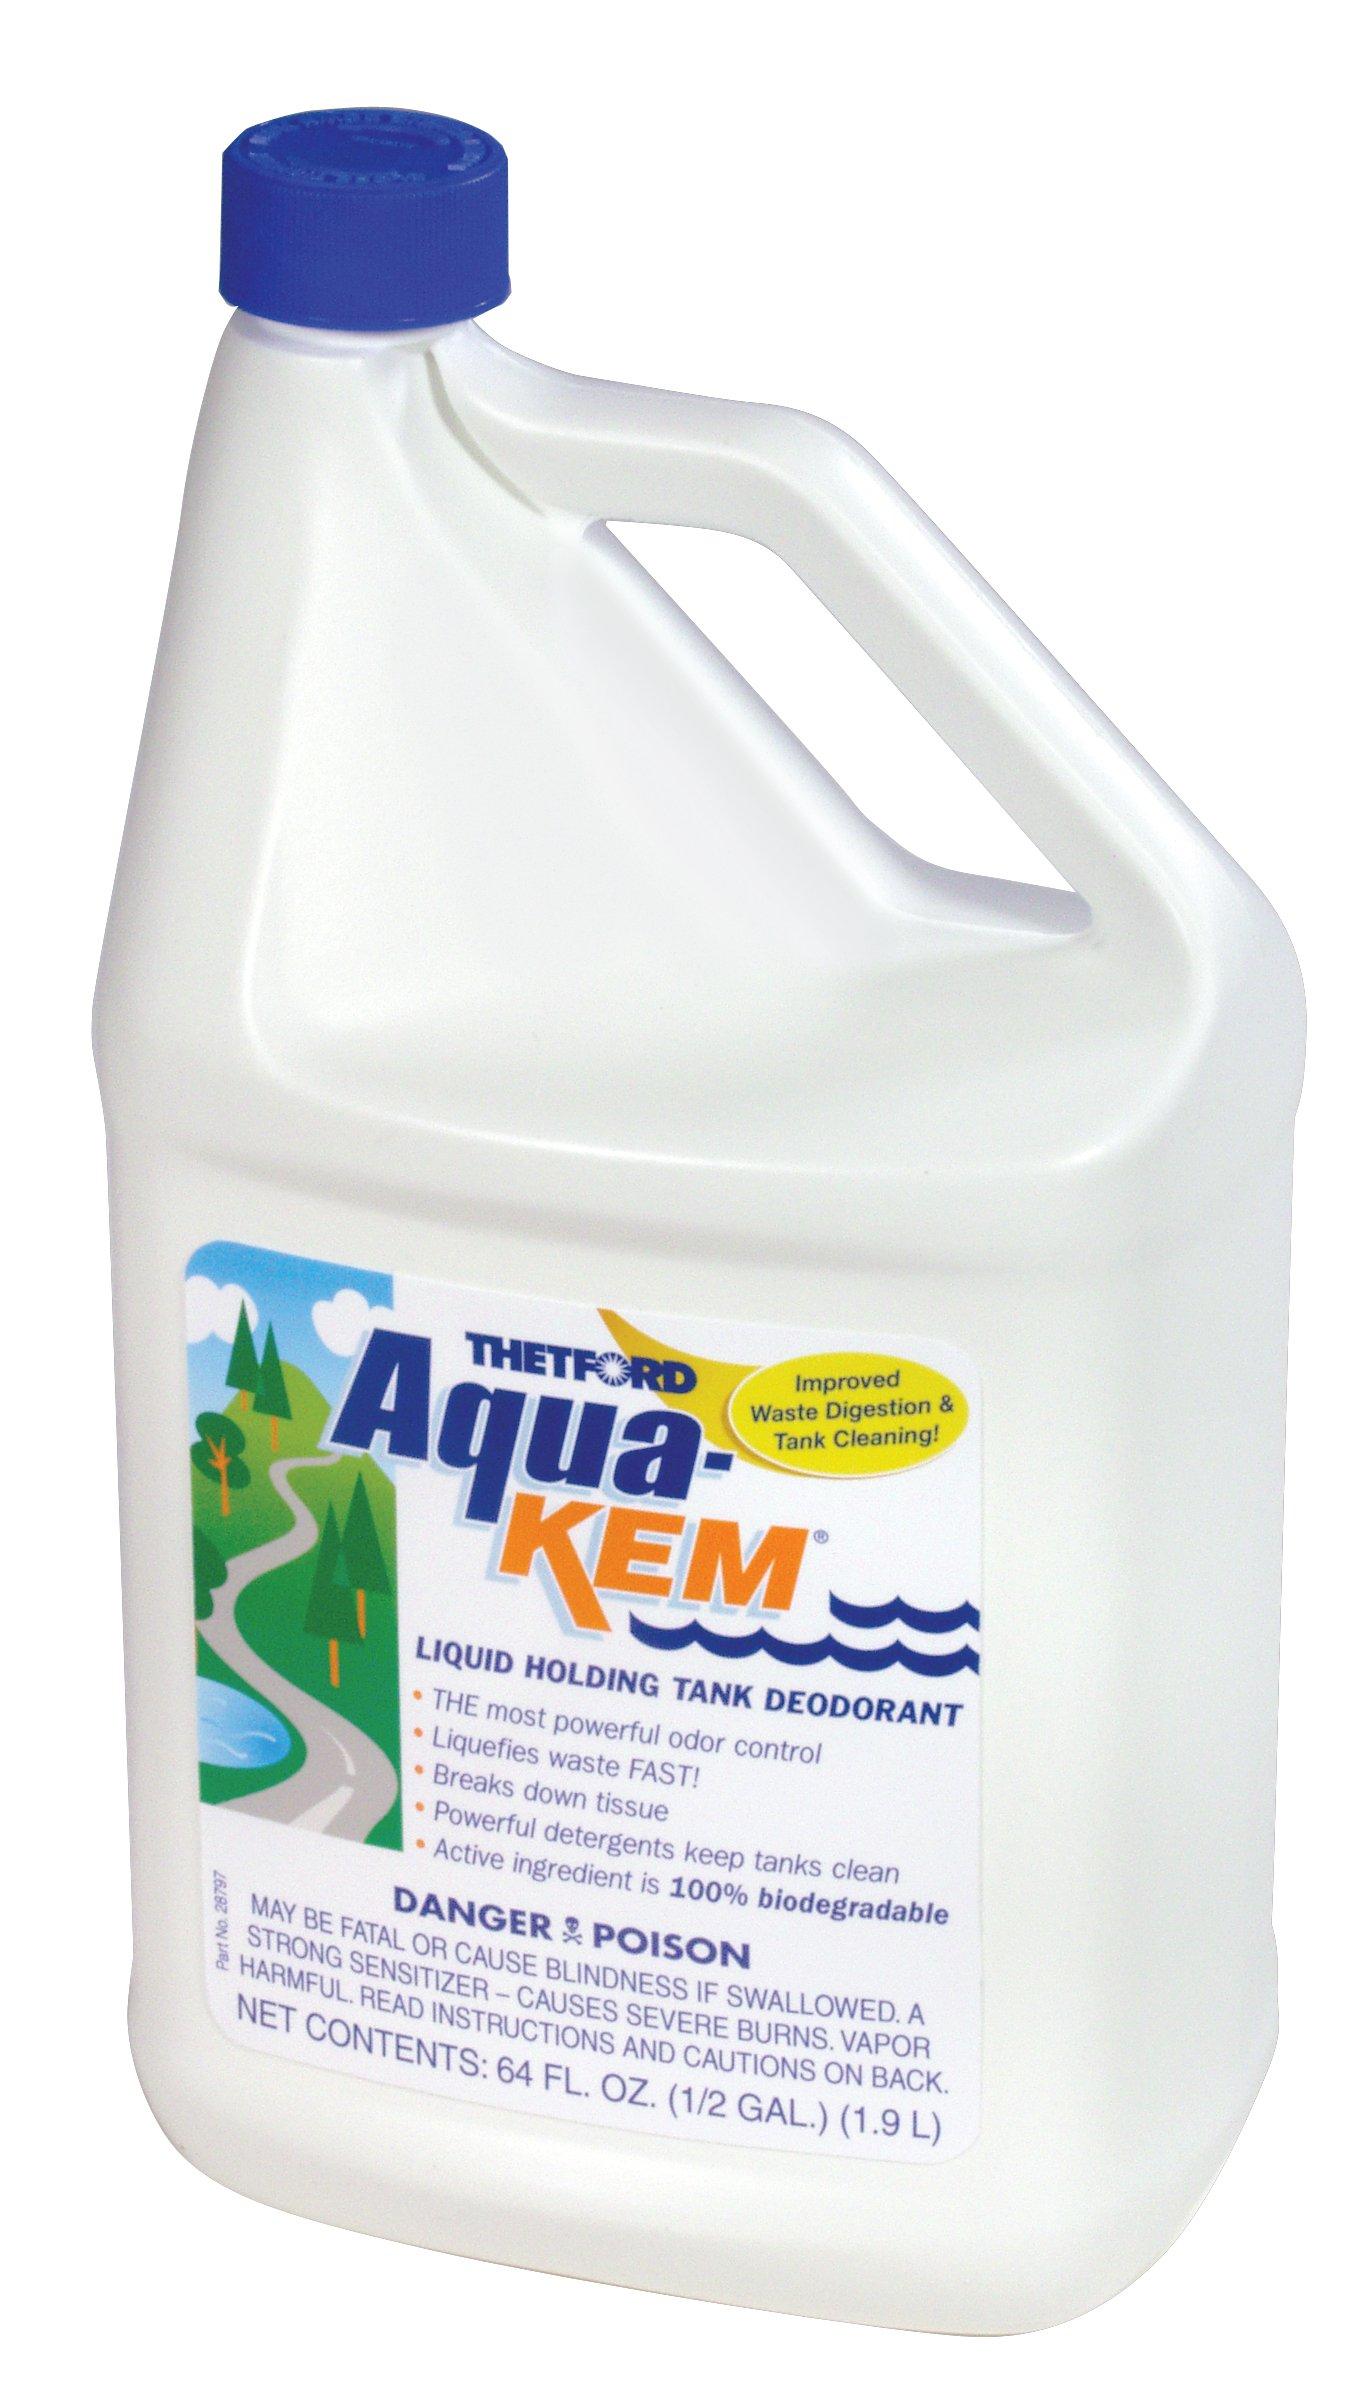 Thetford Aqua-Kem RV holding tank treatment - Deodorant/Waste Digester/Detergent - 64 oz 24260